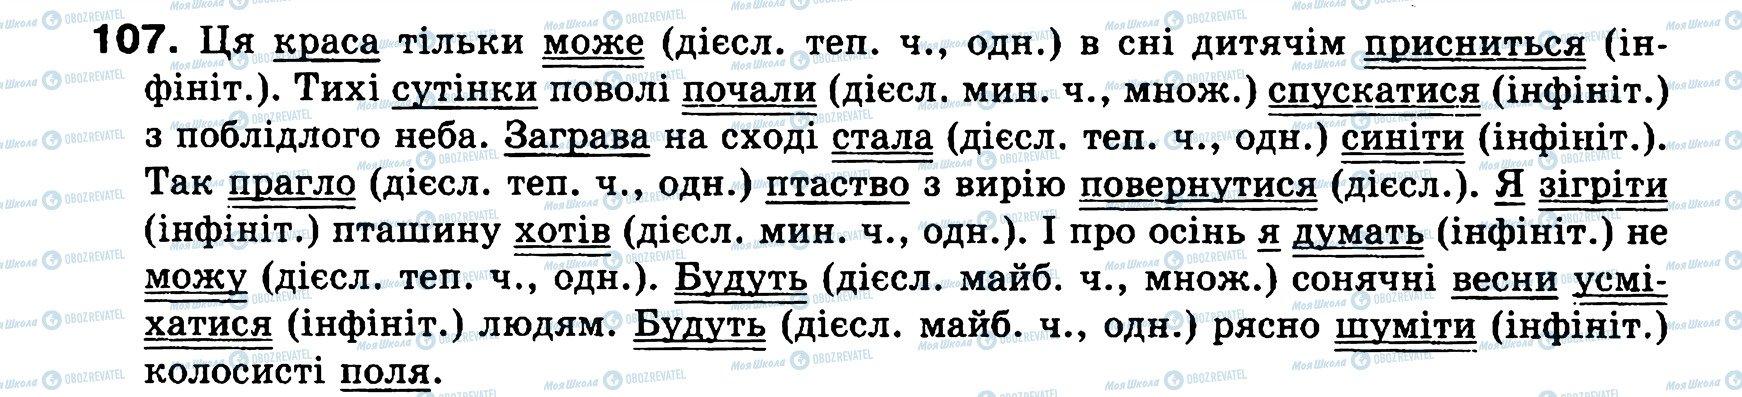 ГДЗ Укр мова 8 класс страница 107